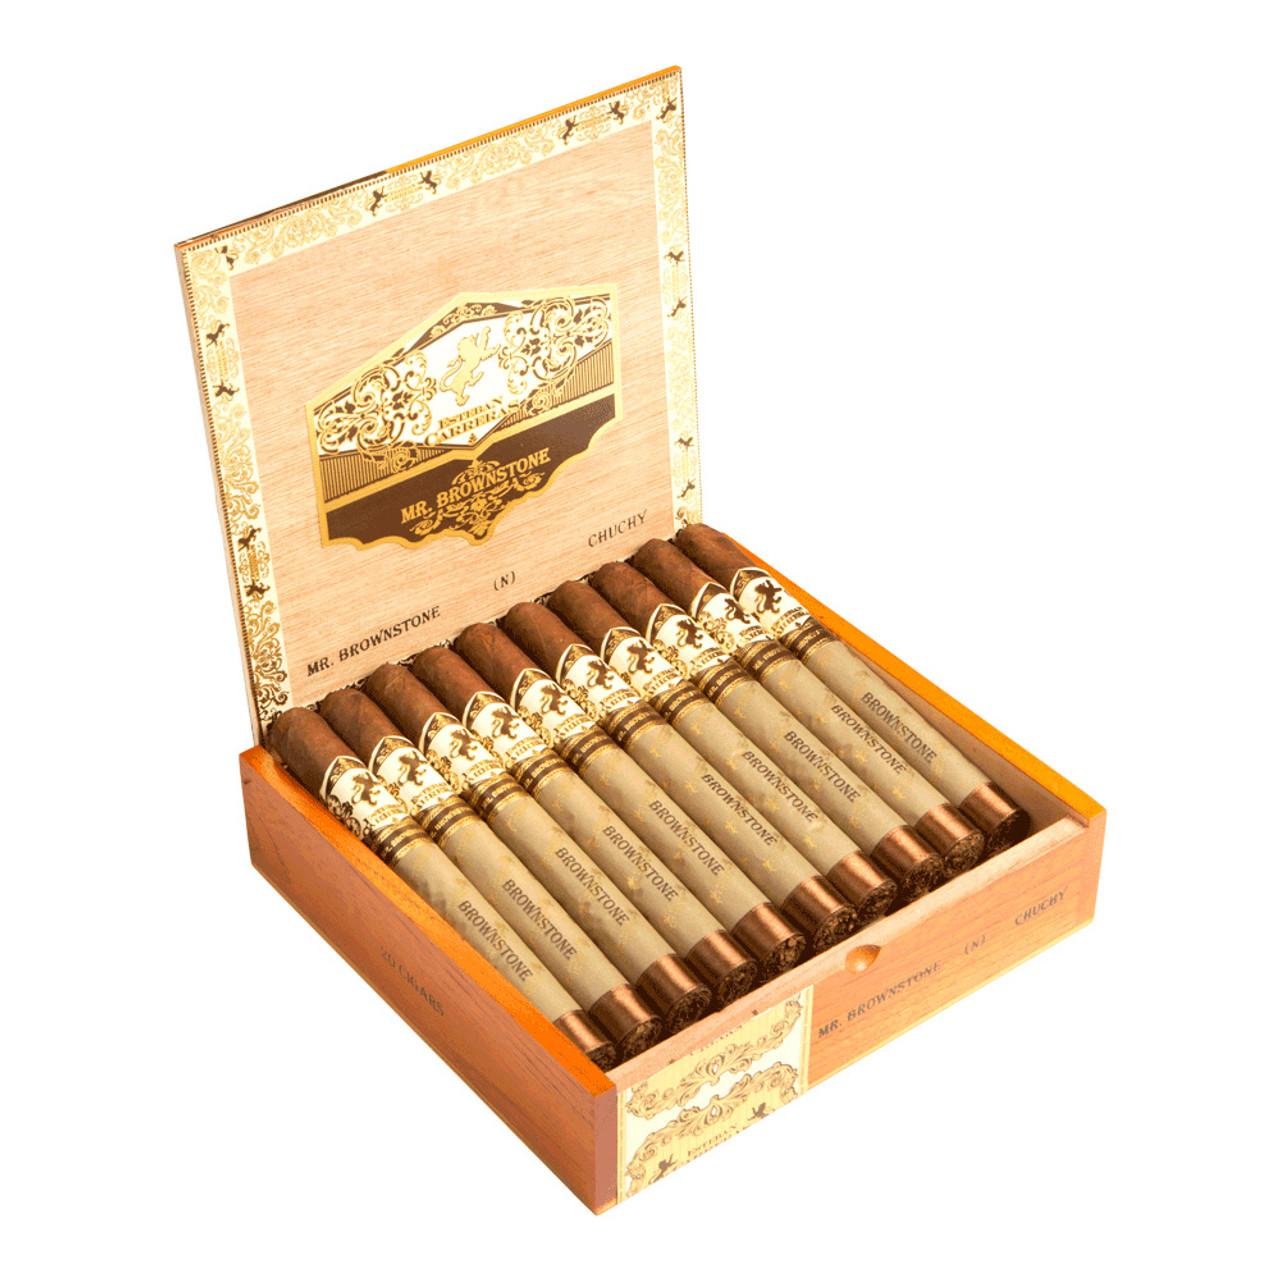 Esteban Carreras Mr. Brownstone Habano Chuchy Cigars - 7 x 49 (Box of 20)